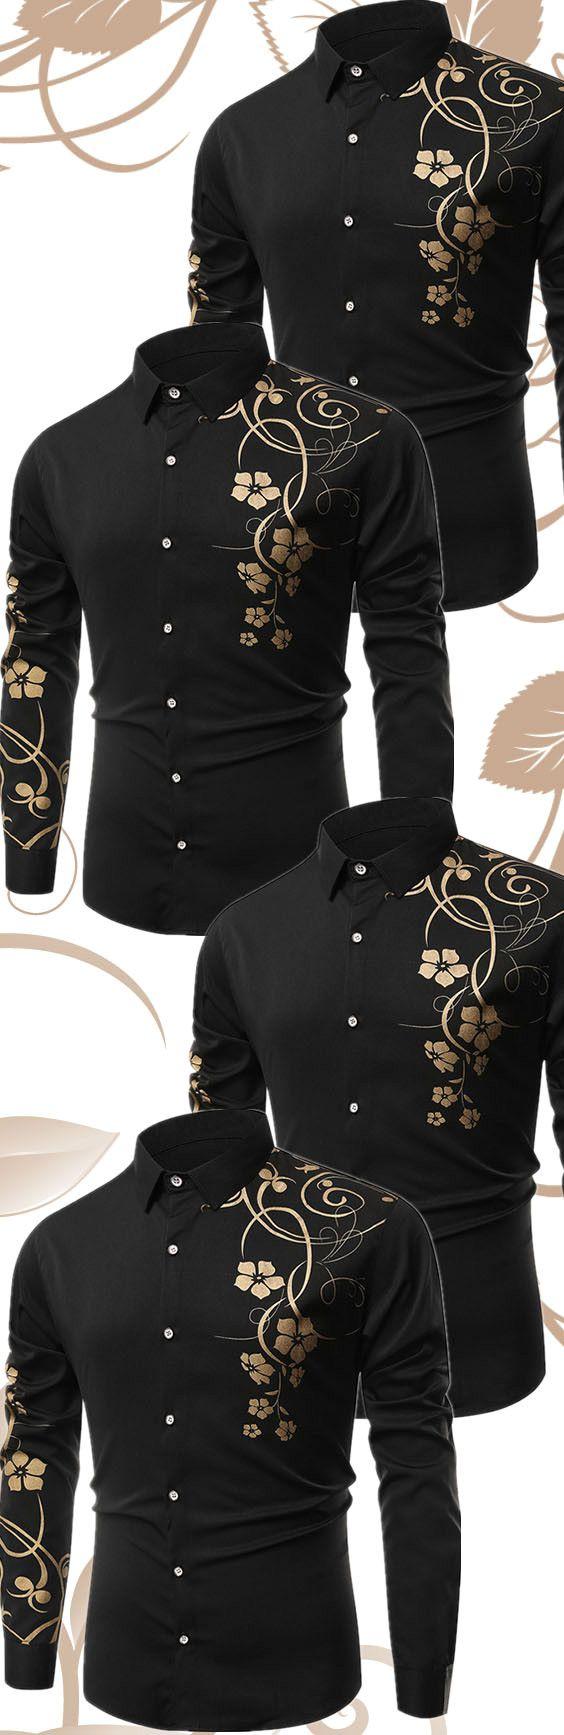 $19.80 Floral Printed Long Sleeves Shirt - Black